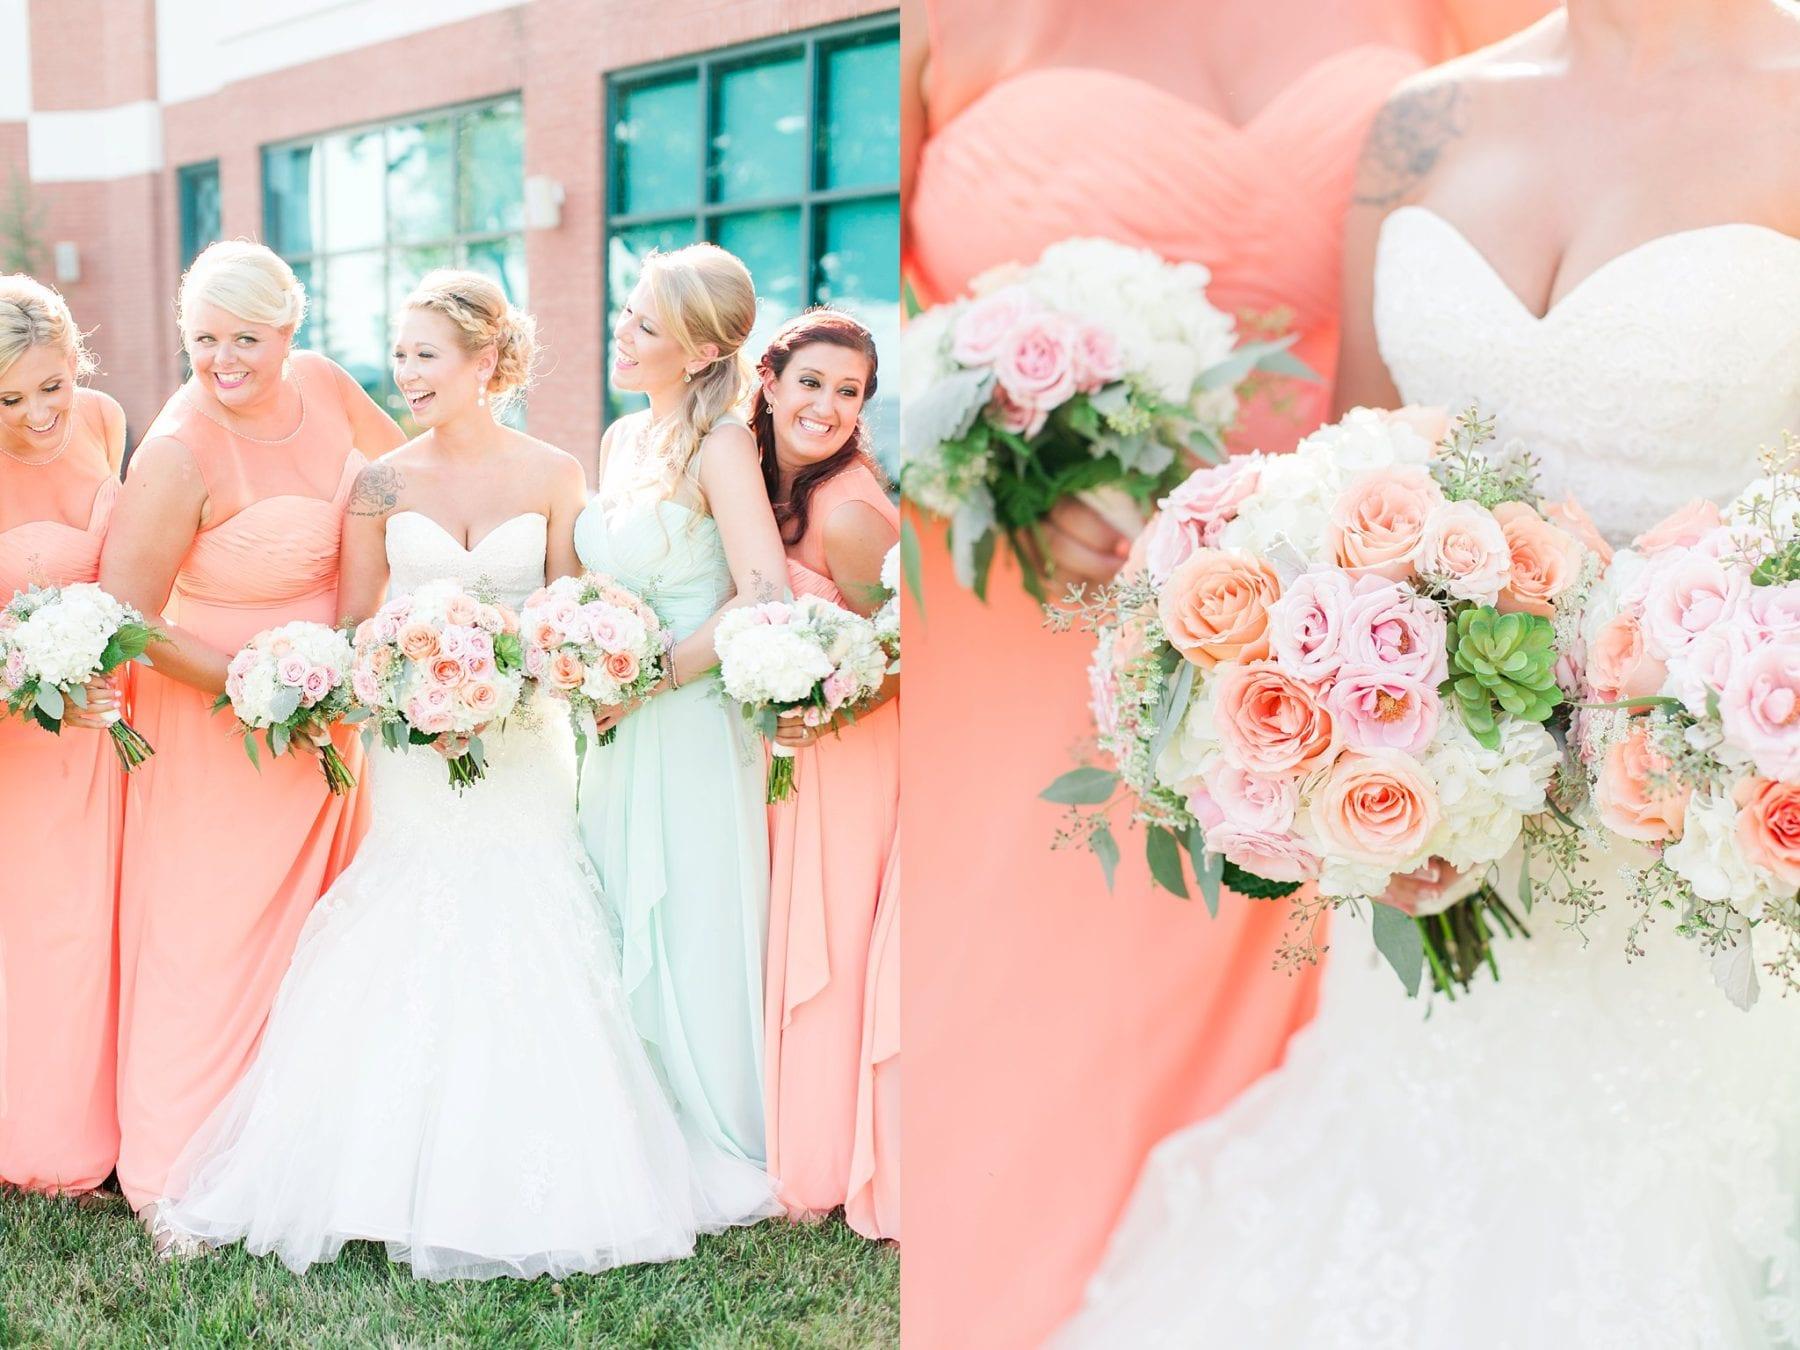 Waters Edge Wedding Photos Maryland Wedding Photographer Megan Kelsey Photography Katie & Conor-372.JPG